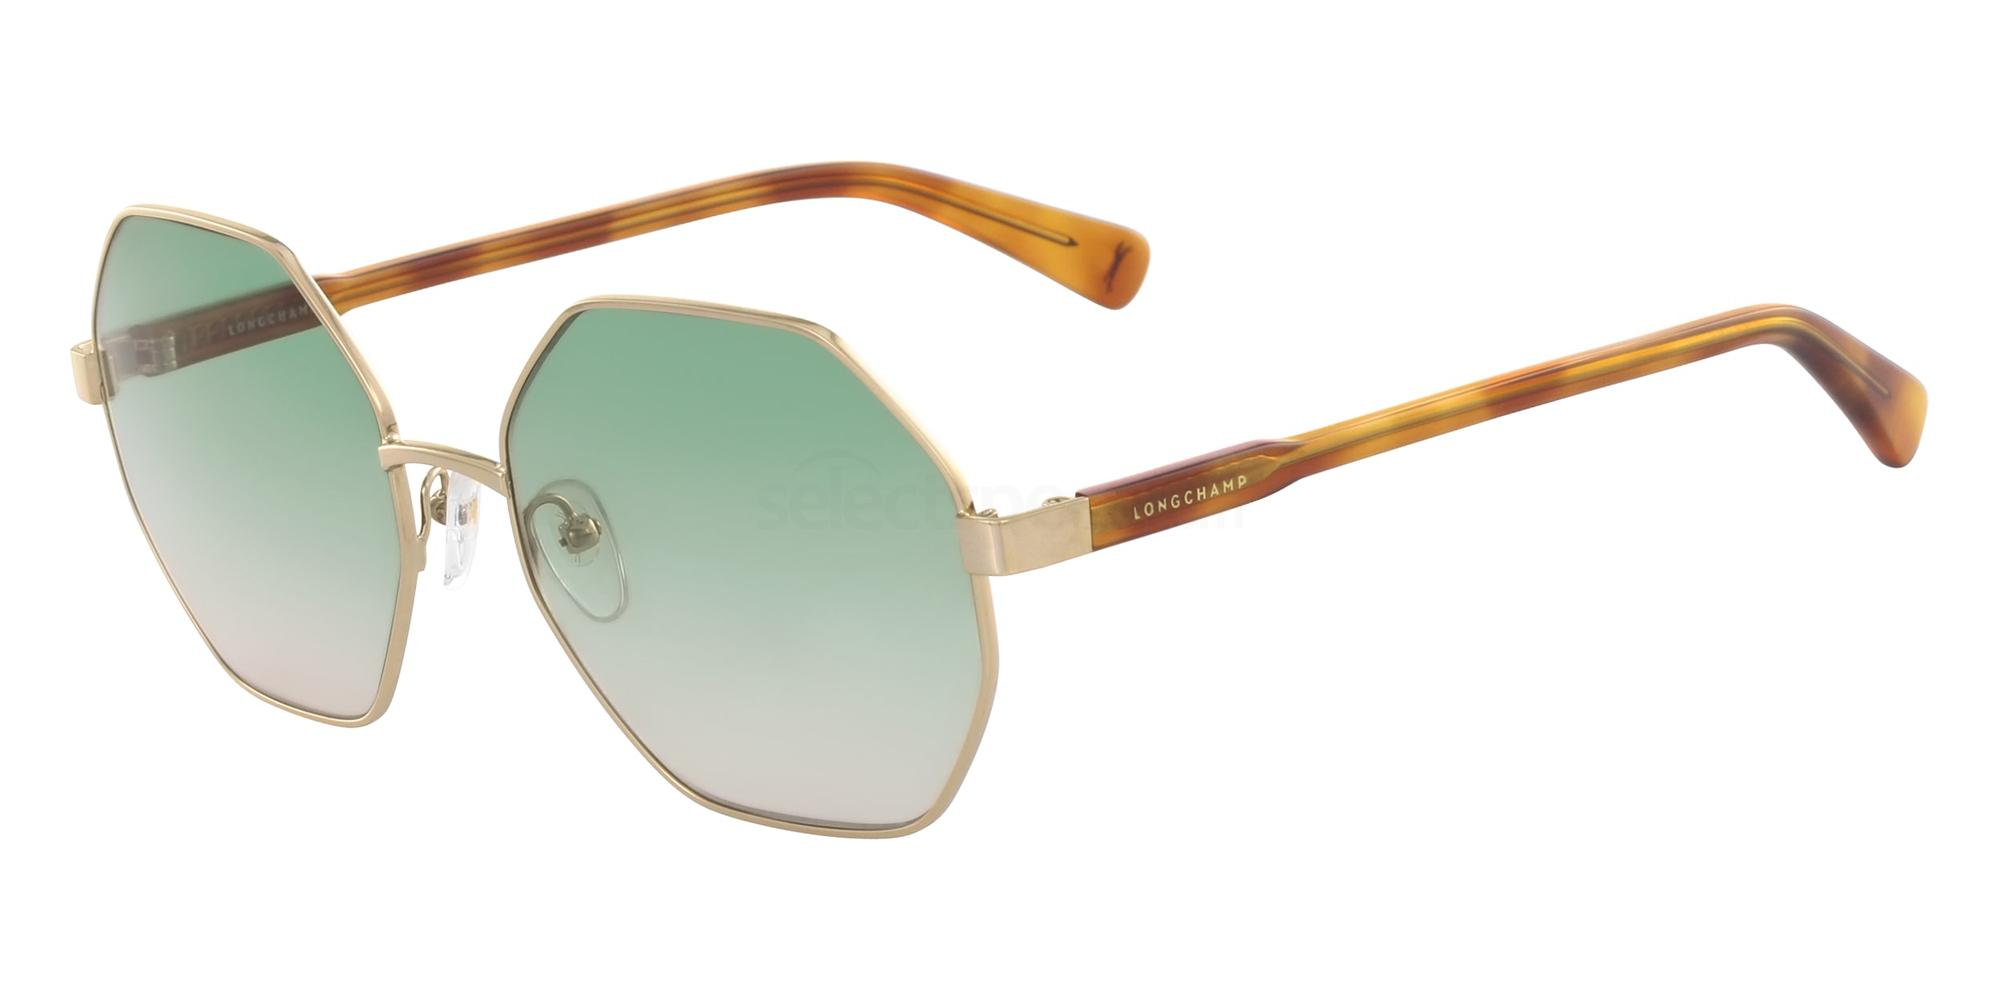 713 LO106S Sunglasses, LONGCHAMP